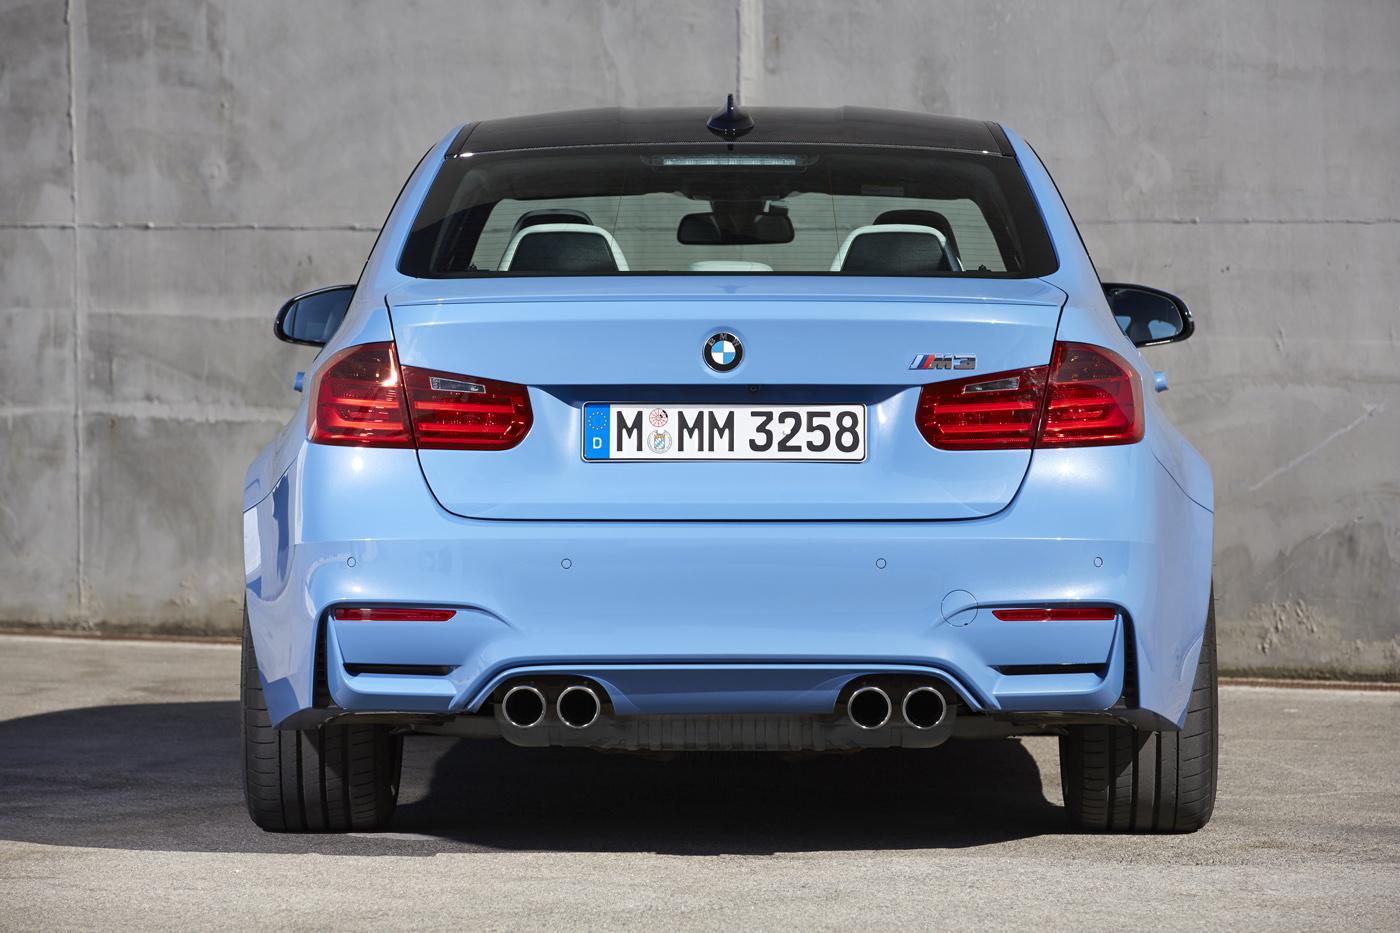 BMW-M3-F80-5.jpeg